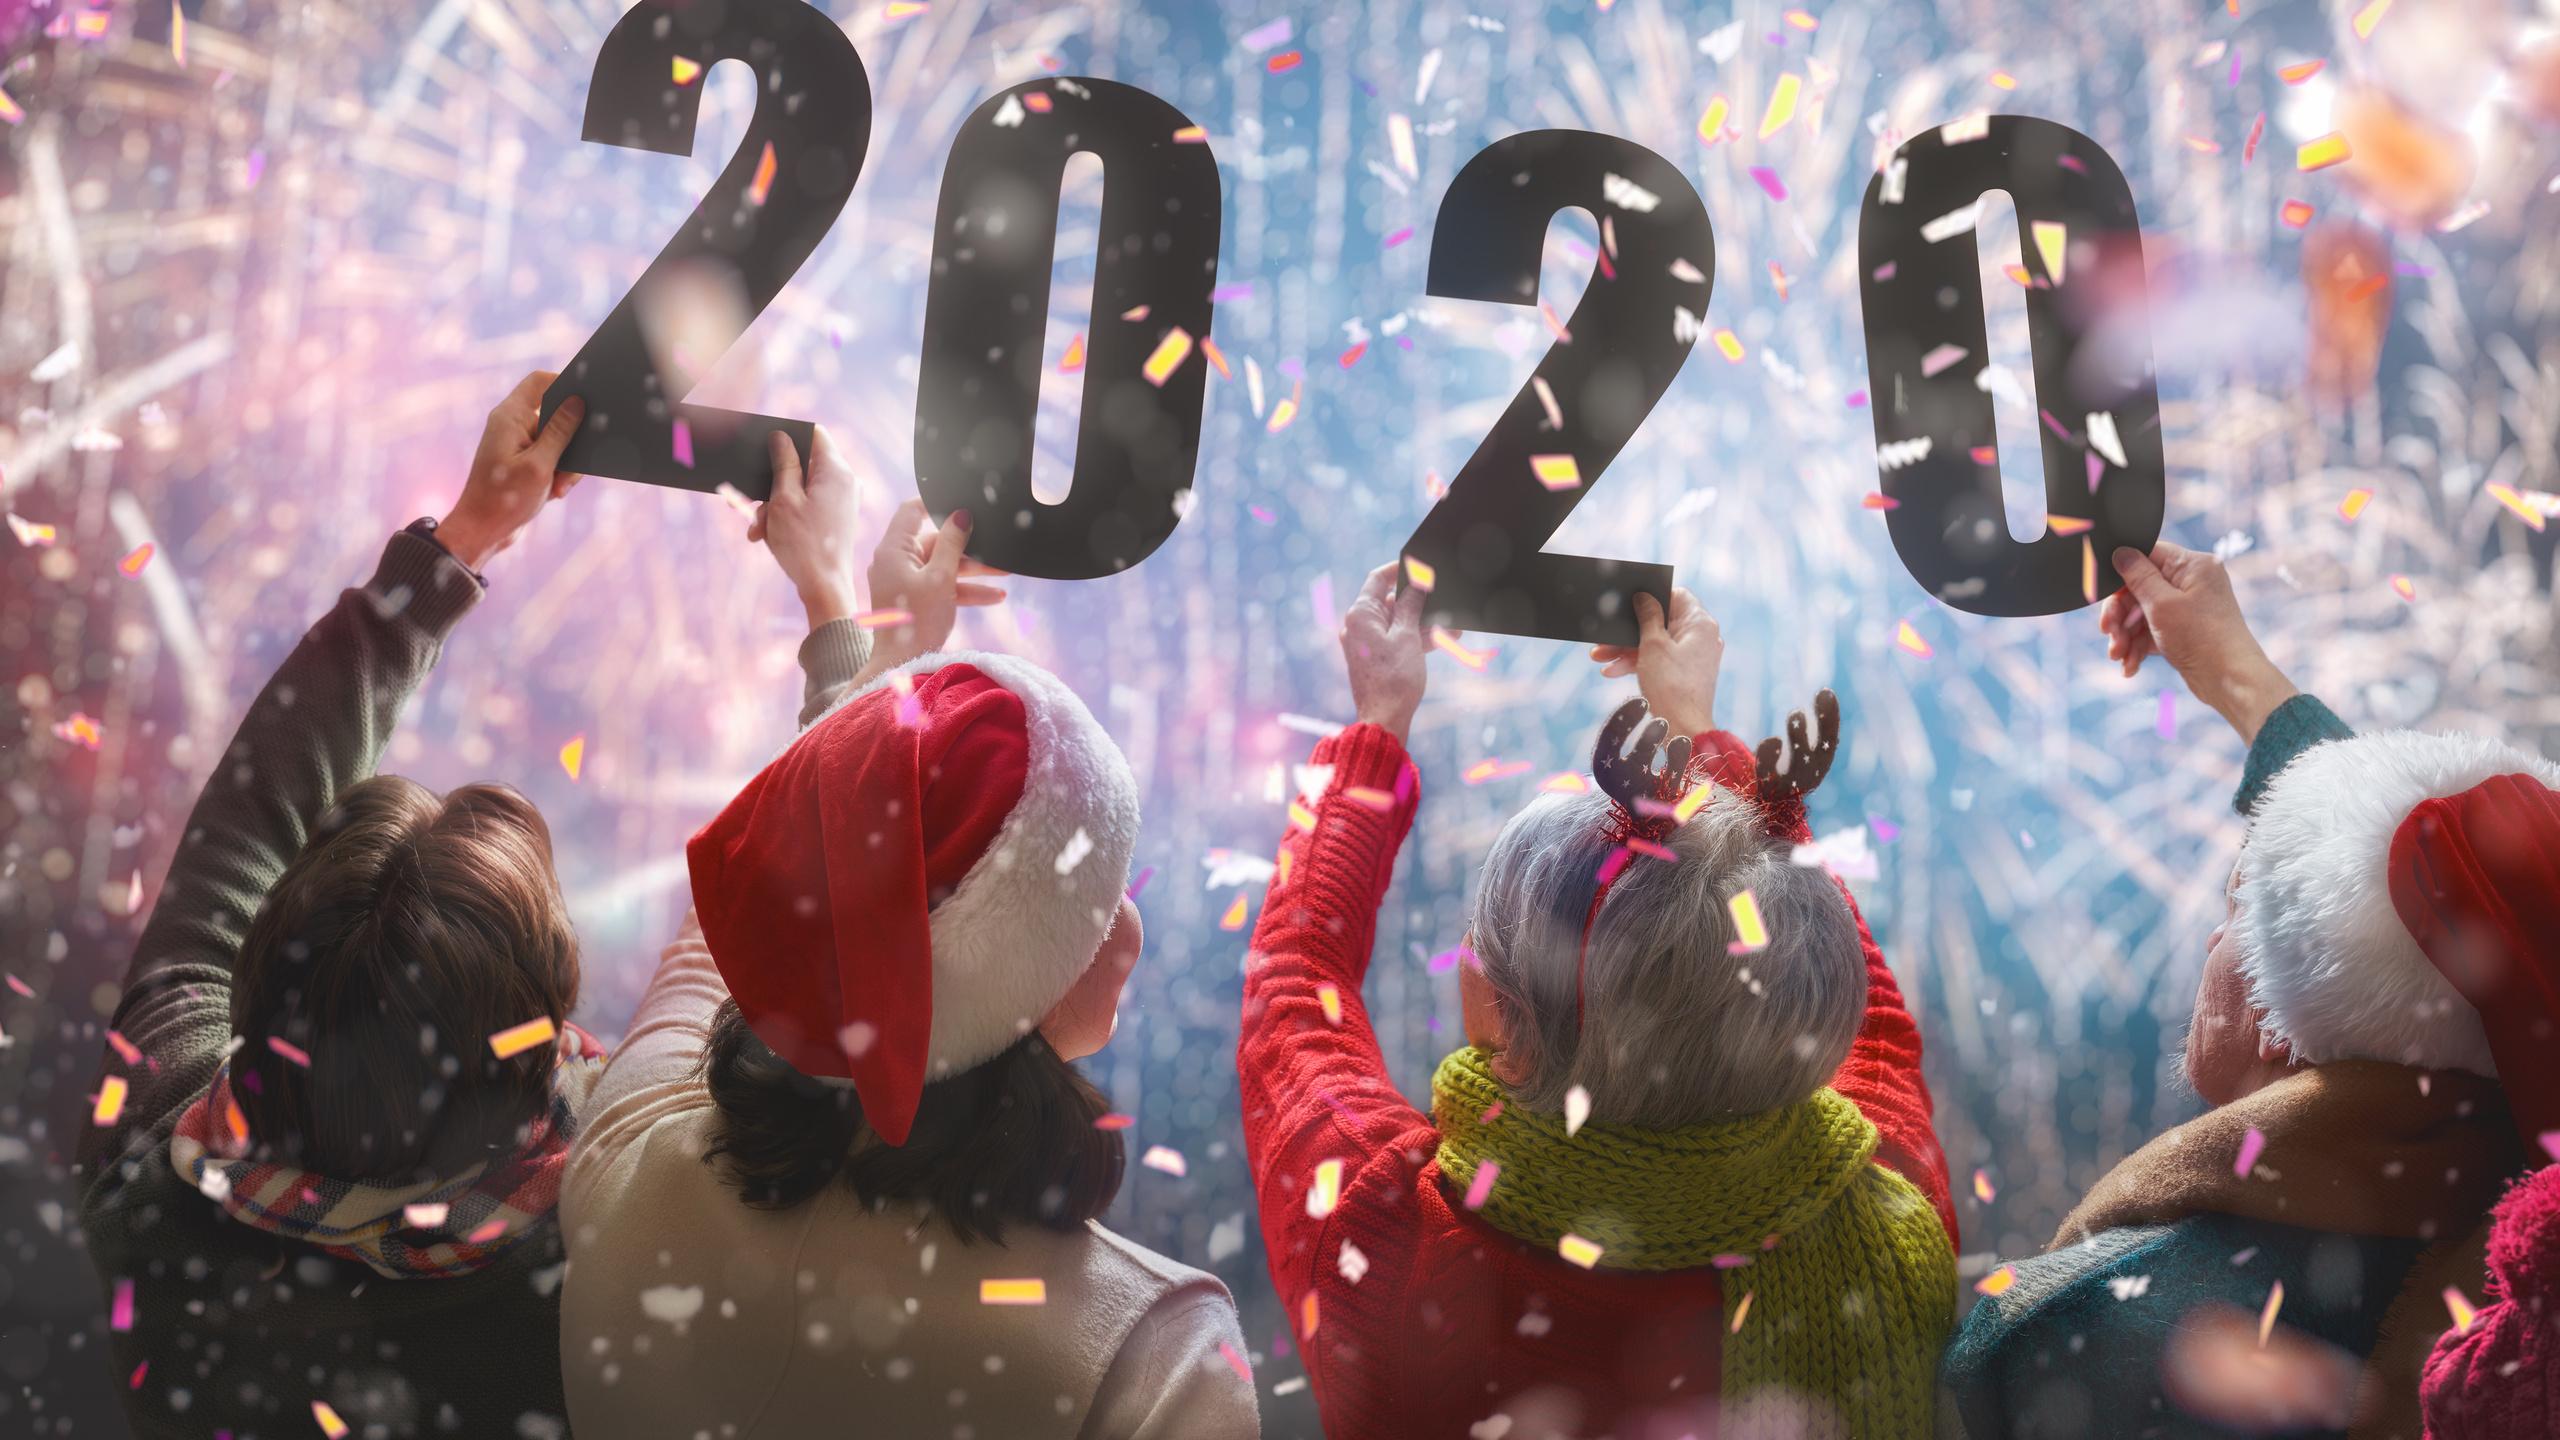 christmas-people-2020-hands-back-view-5k-mx.jpg